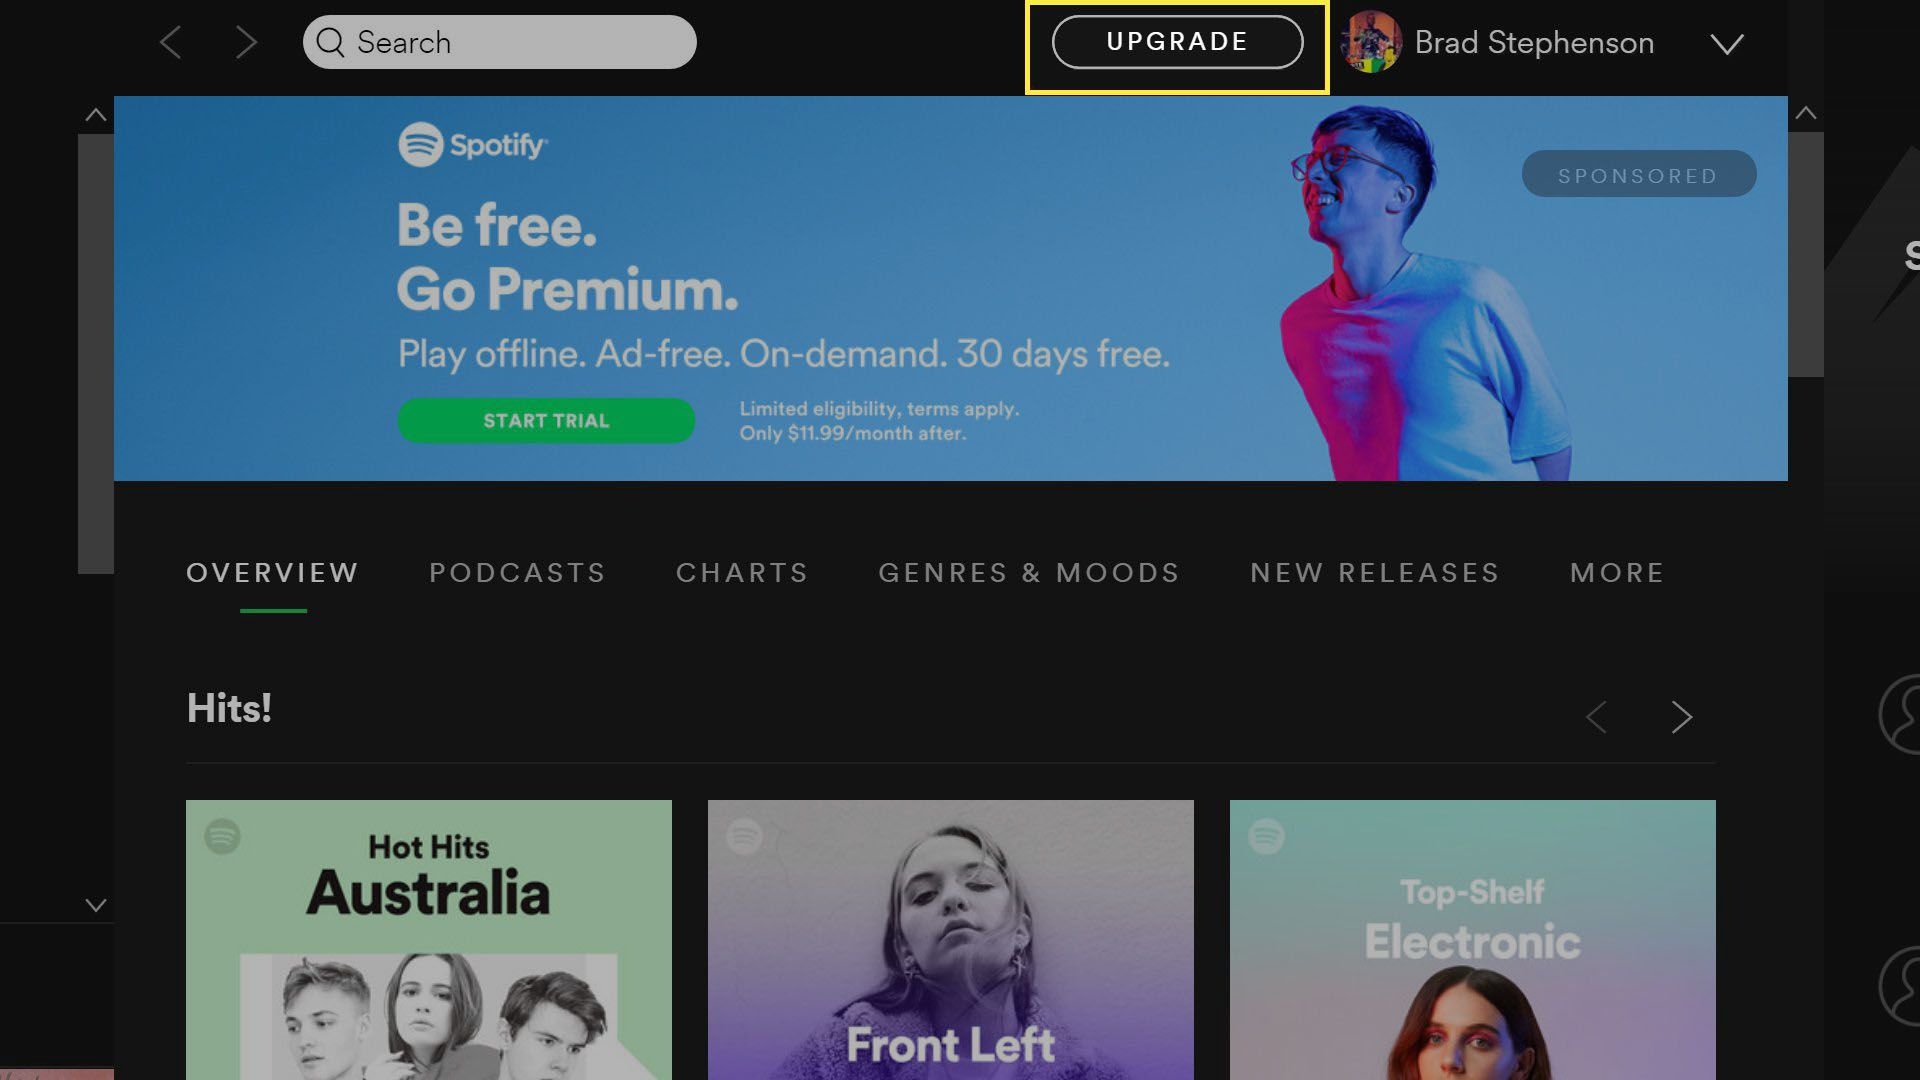 Spotify Premium upgrade button in the Windows 10 Spotify app